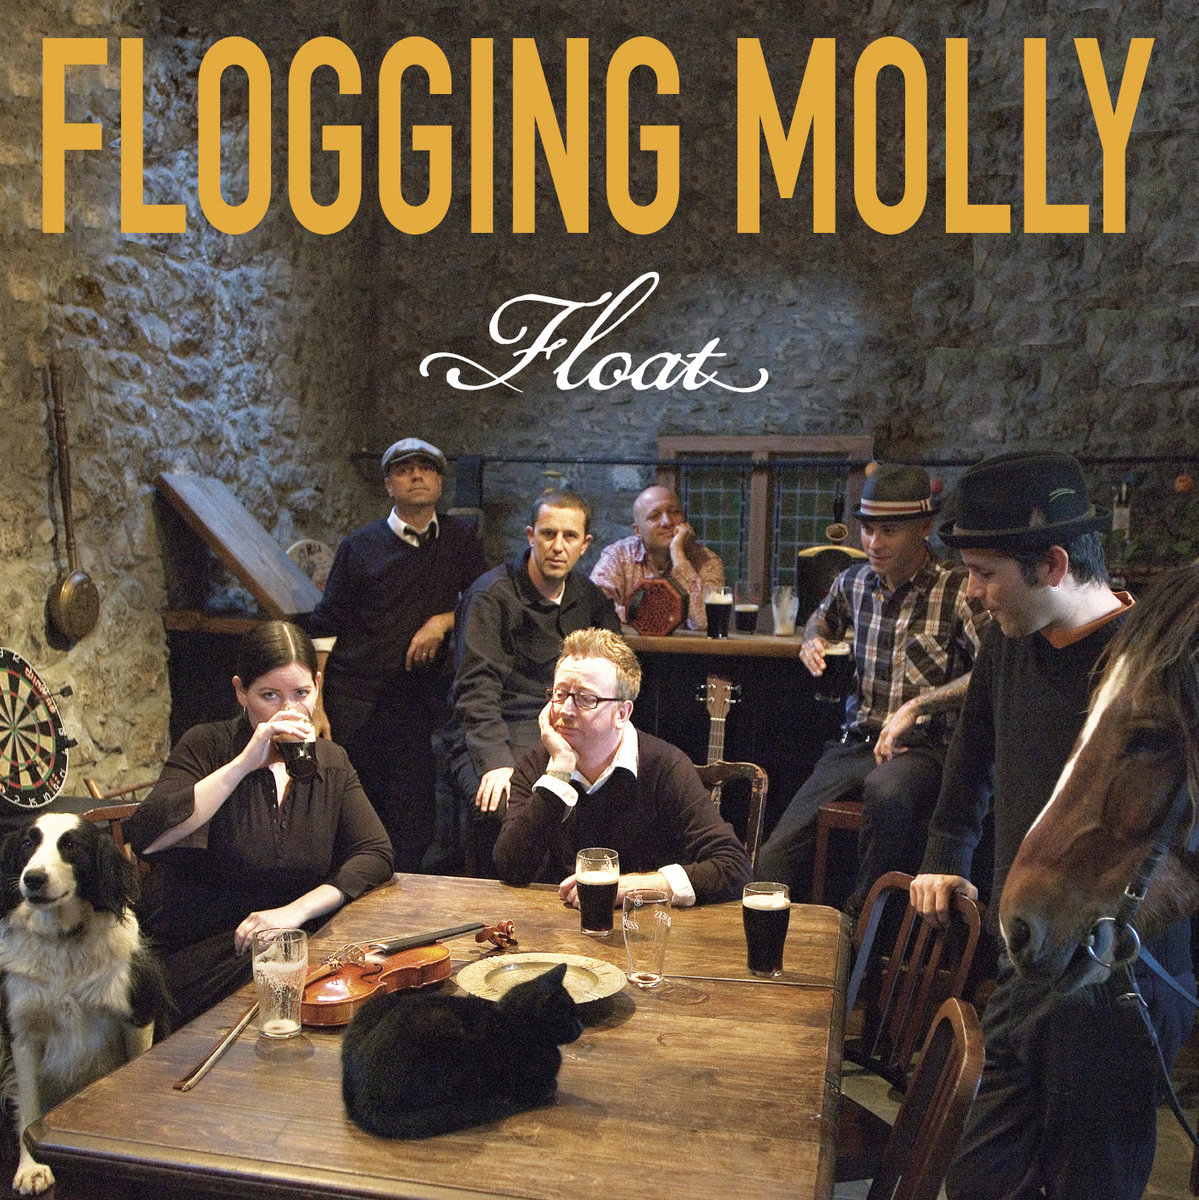 Floggin Molly